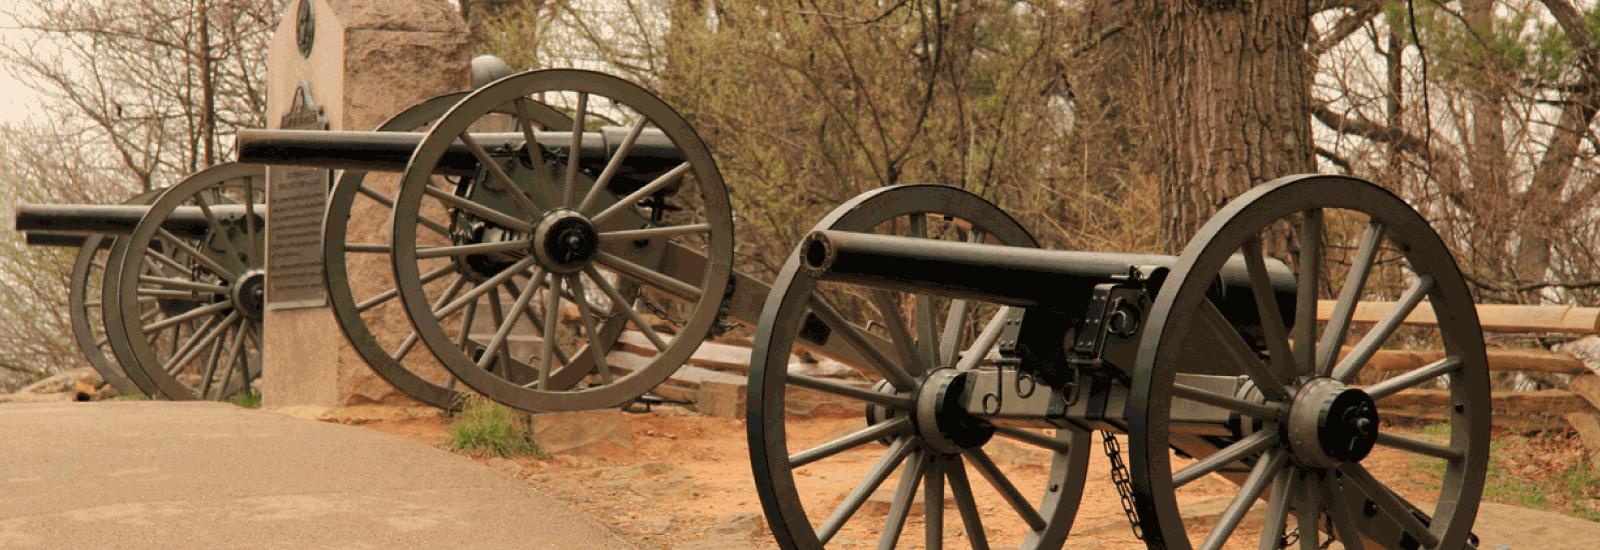 Fort Indiantown Gap Museum